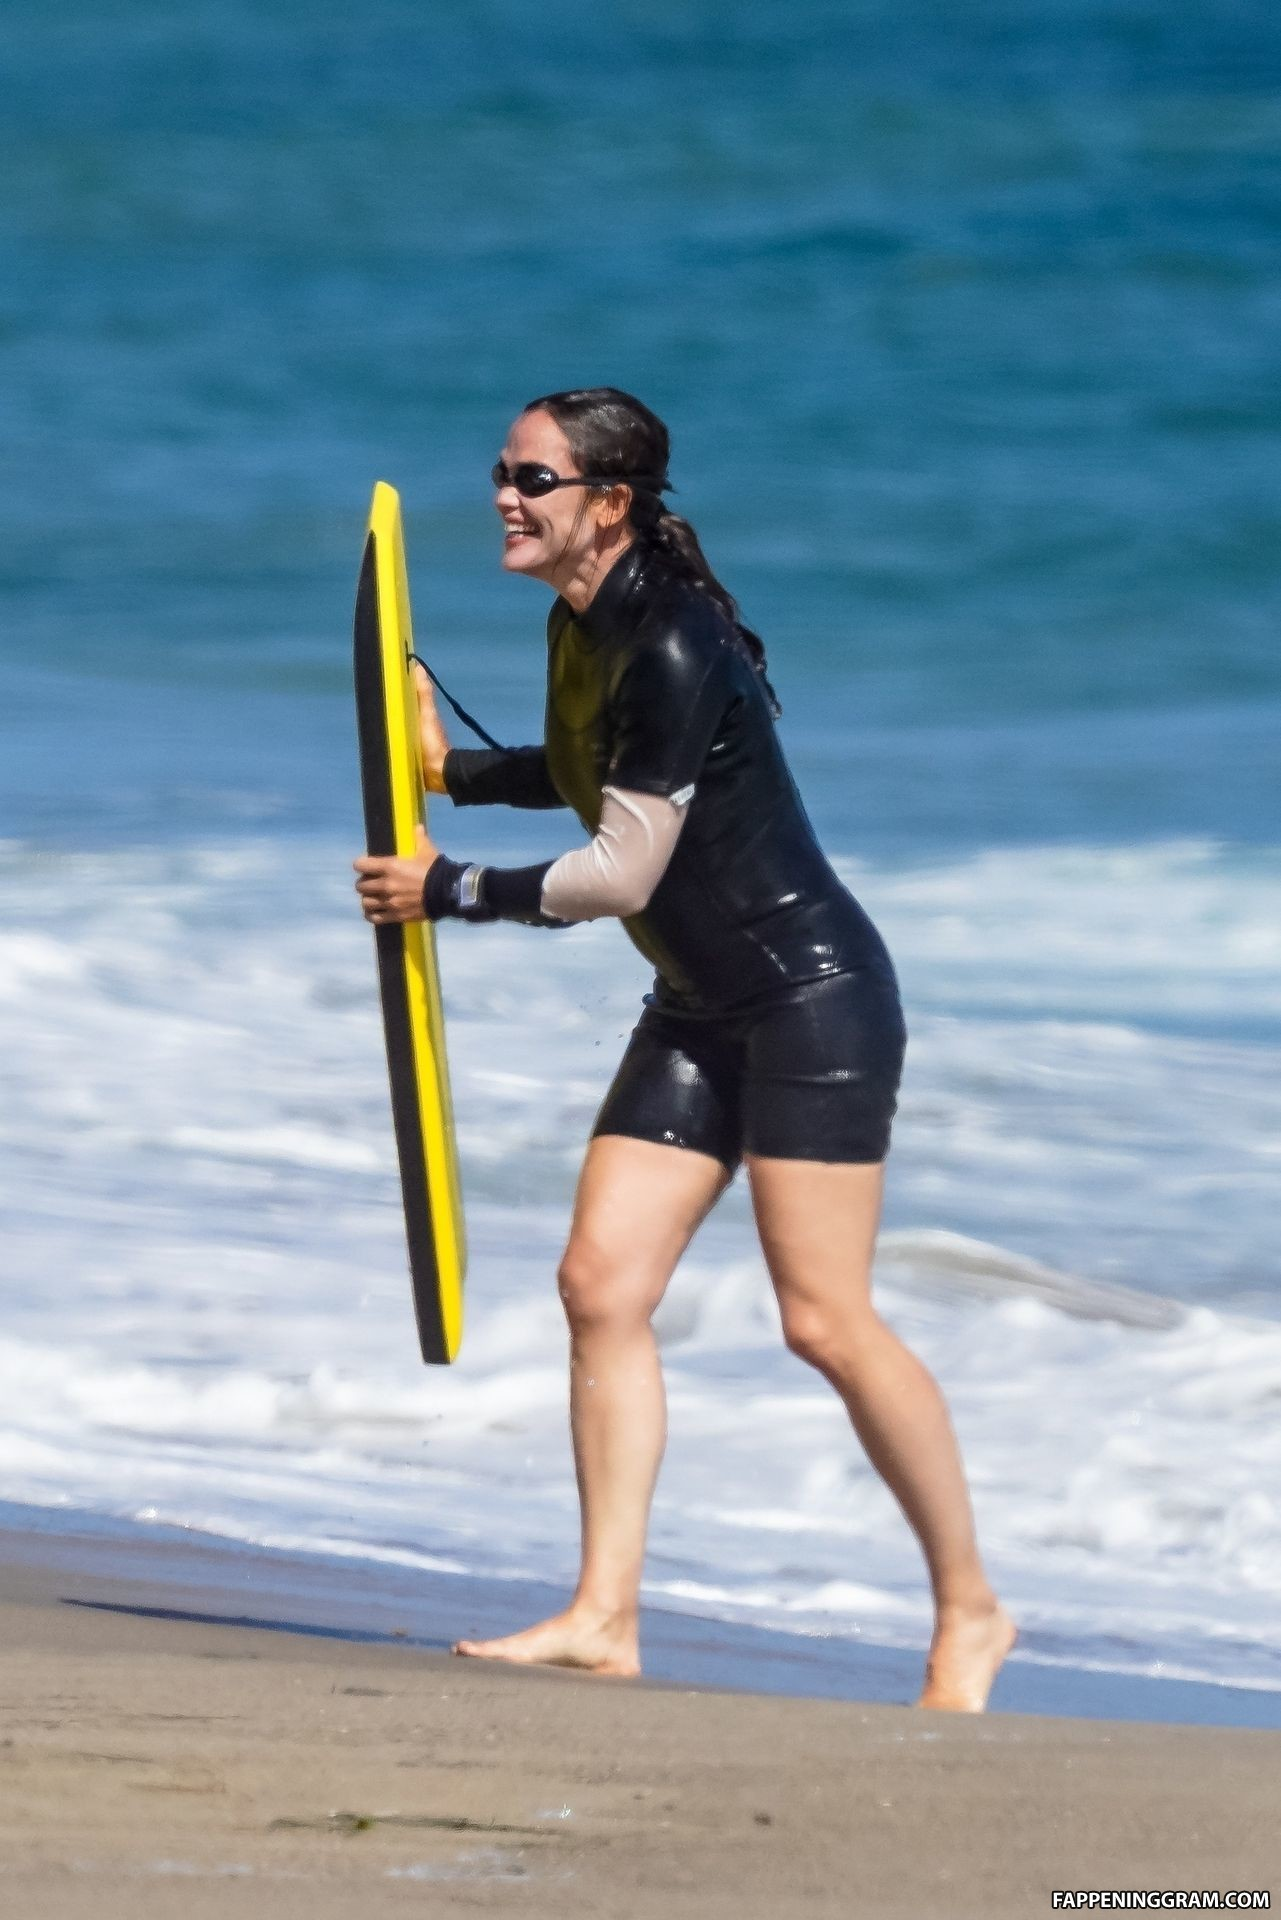 Jennifer Garner Nude The Fappening - Page 7 - FappeningGram